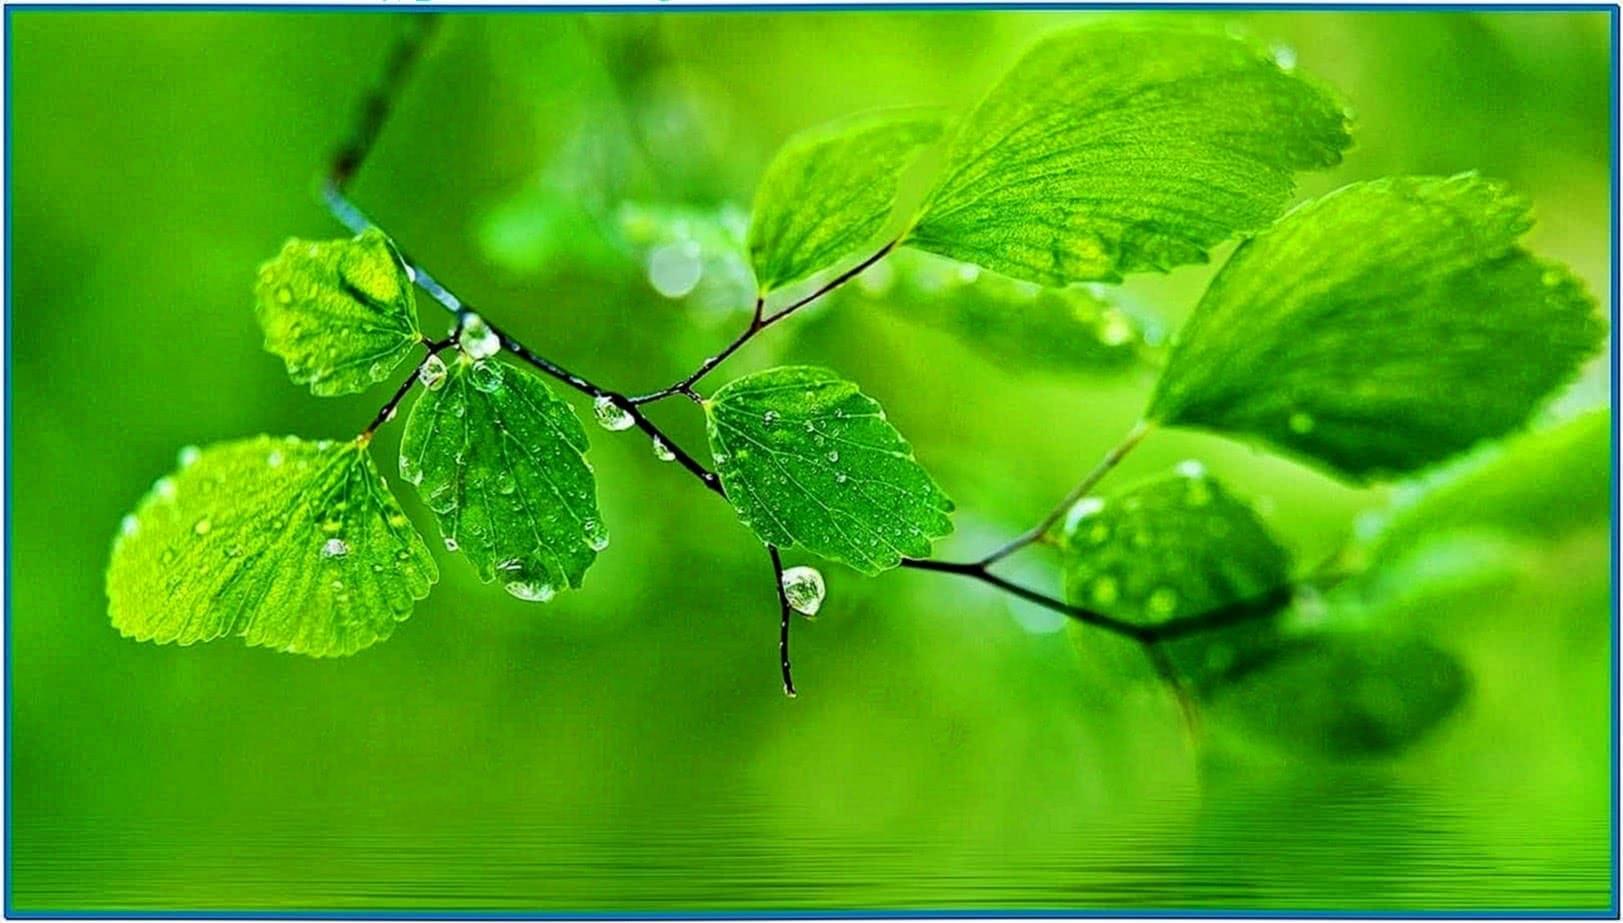 Water Drop Screensaver for PC